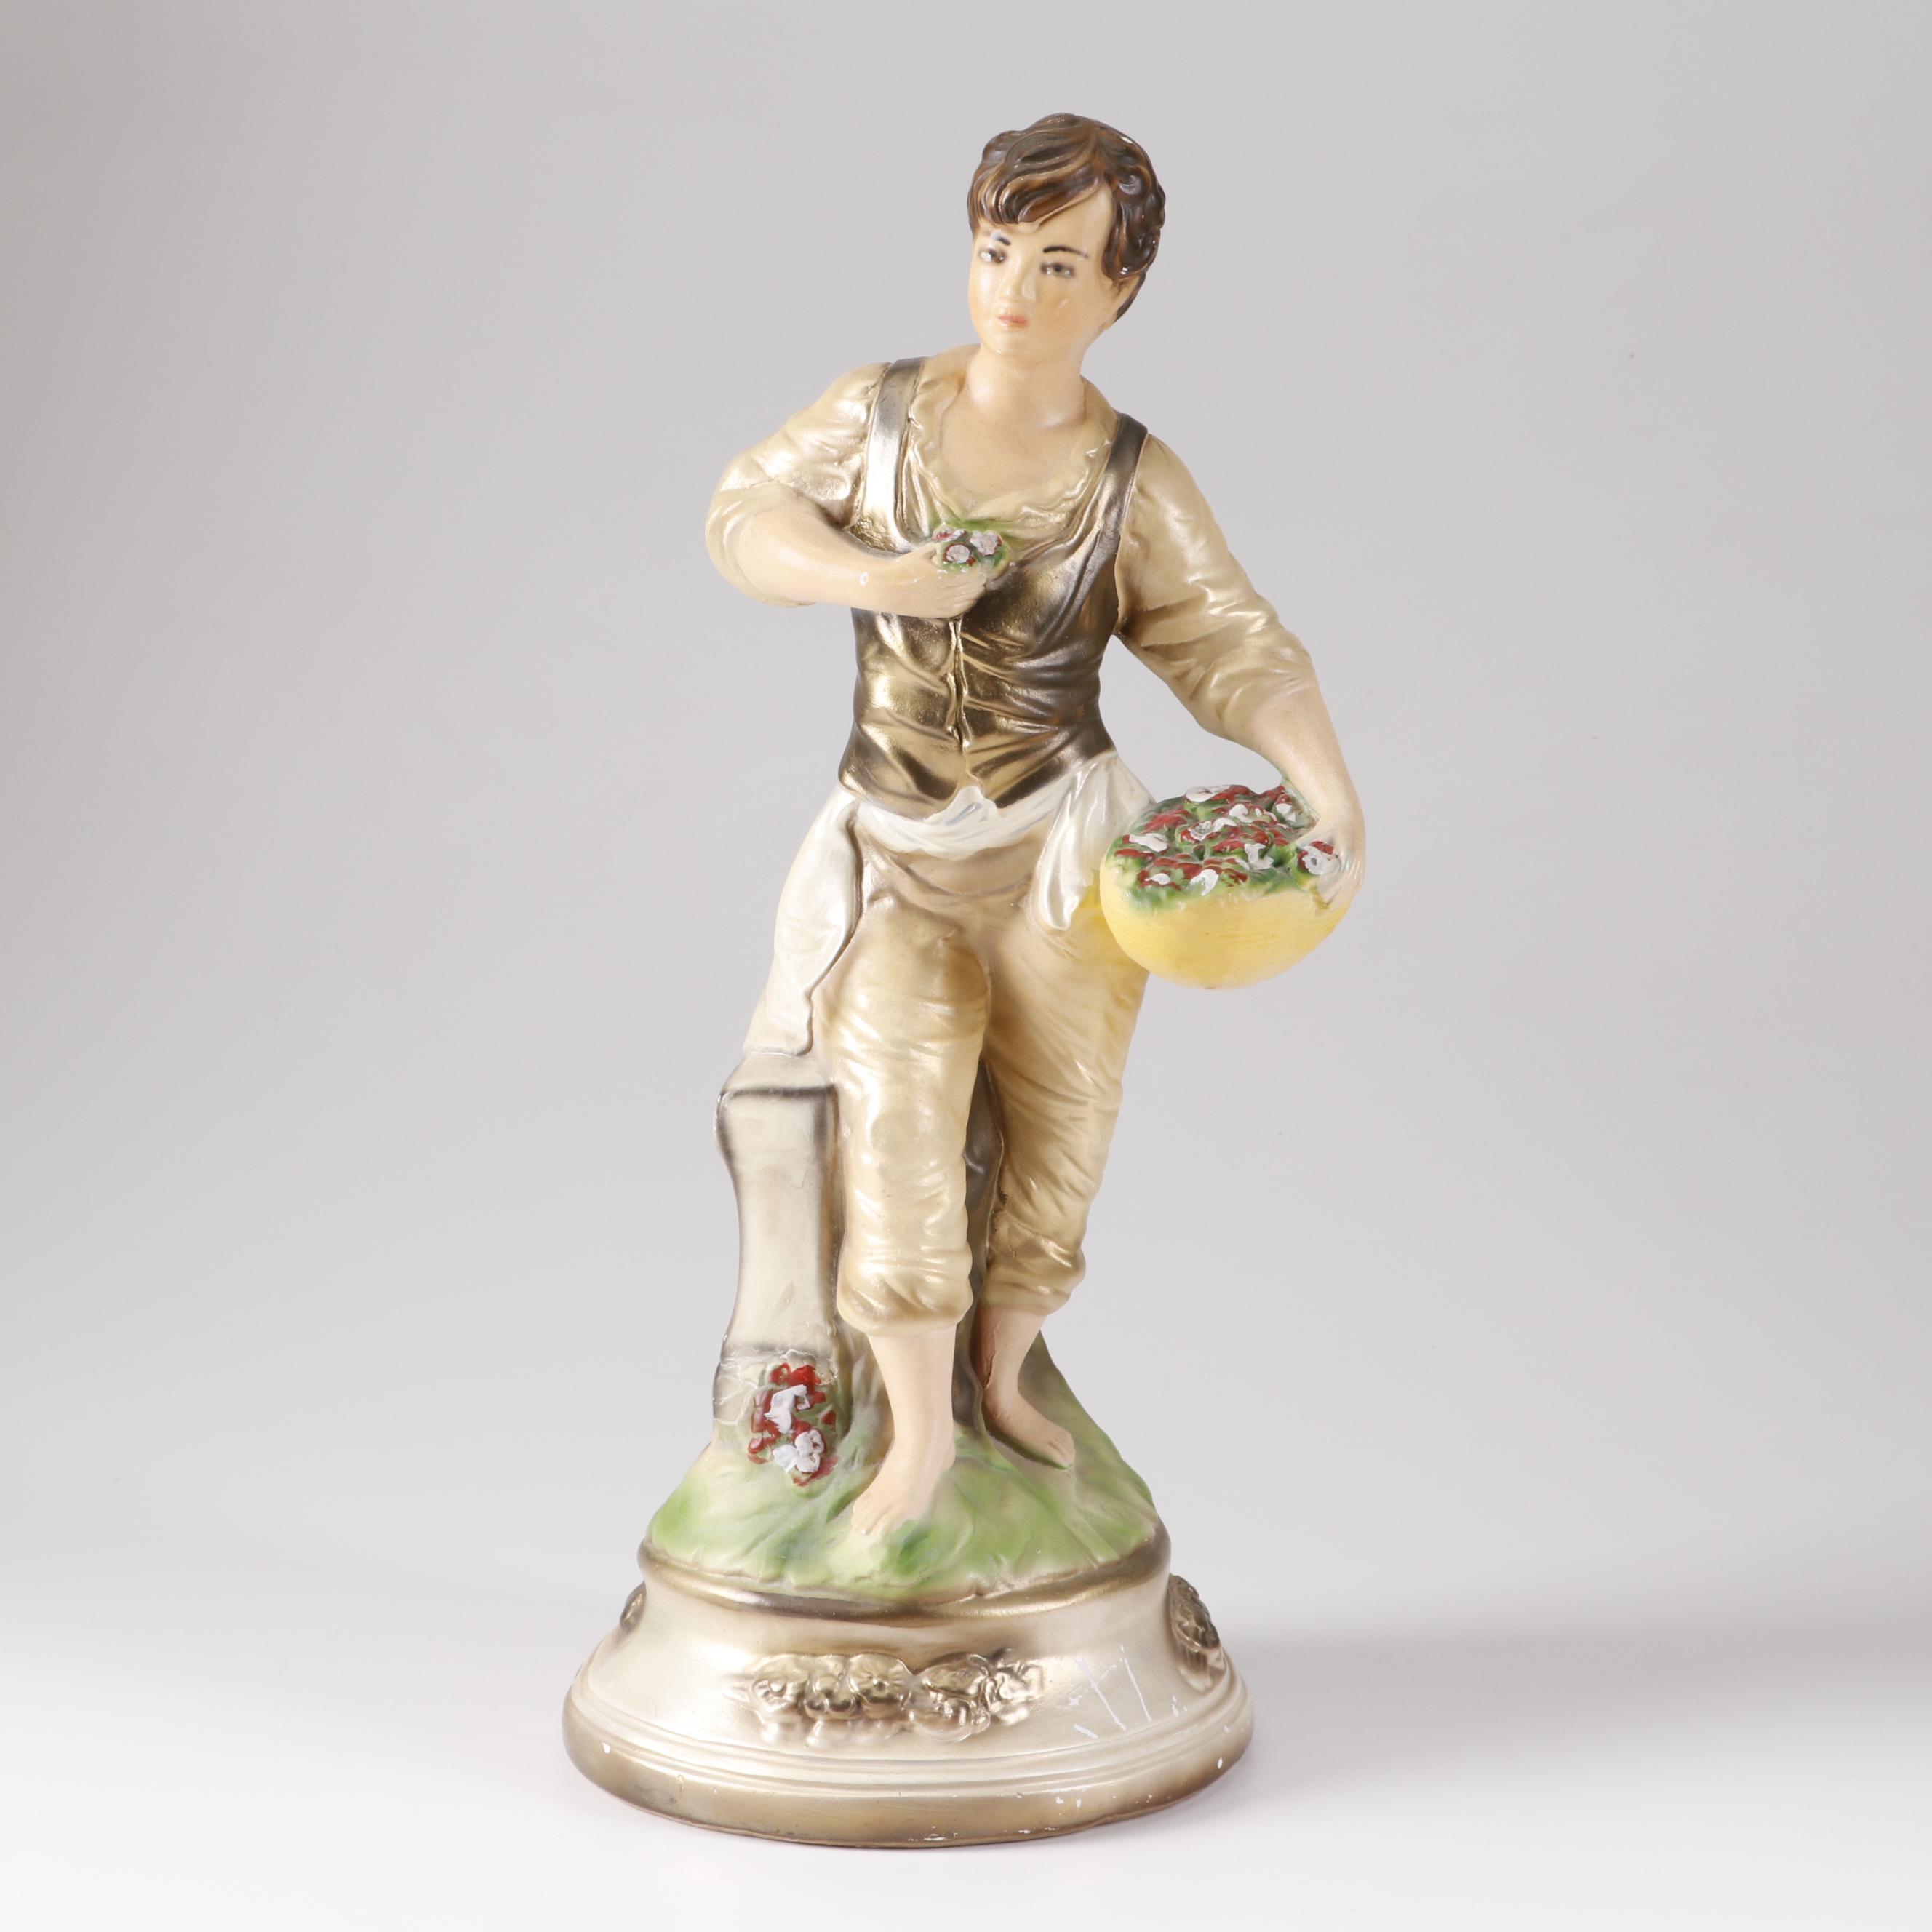 Victorian Boy Chalkware Figurine, Early 20th Century